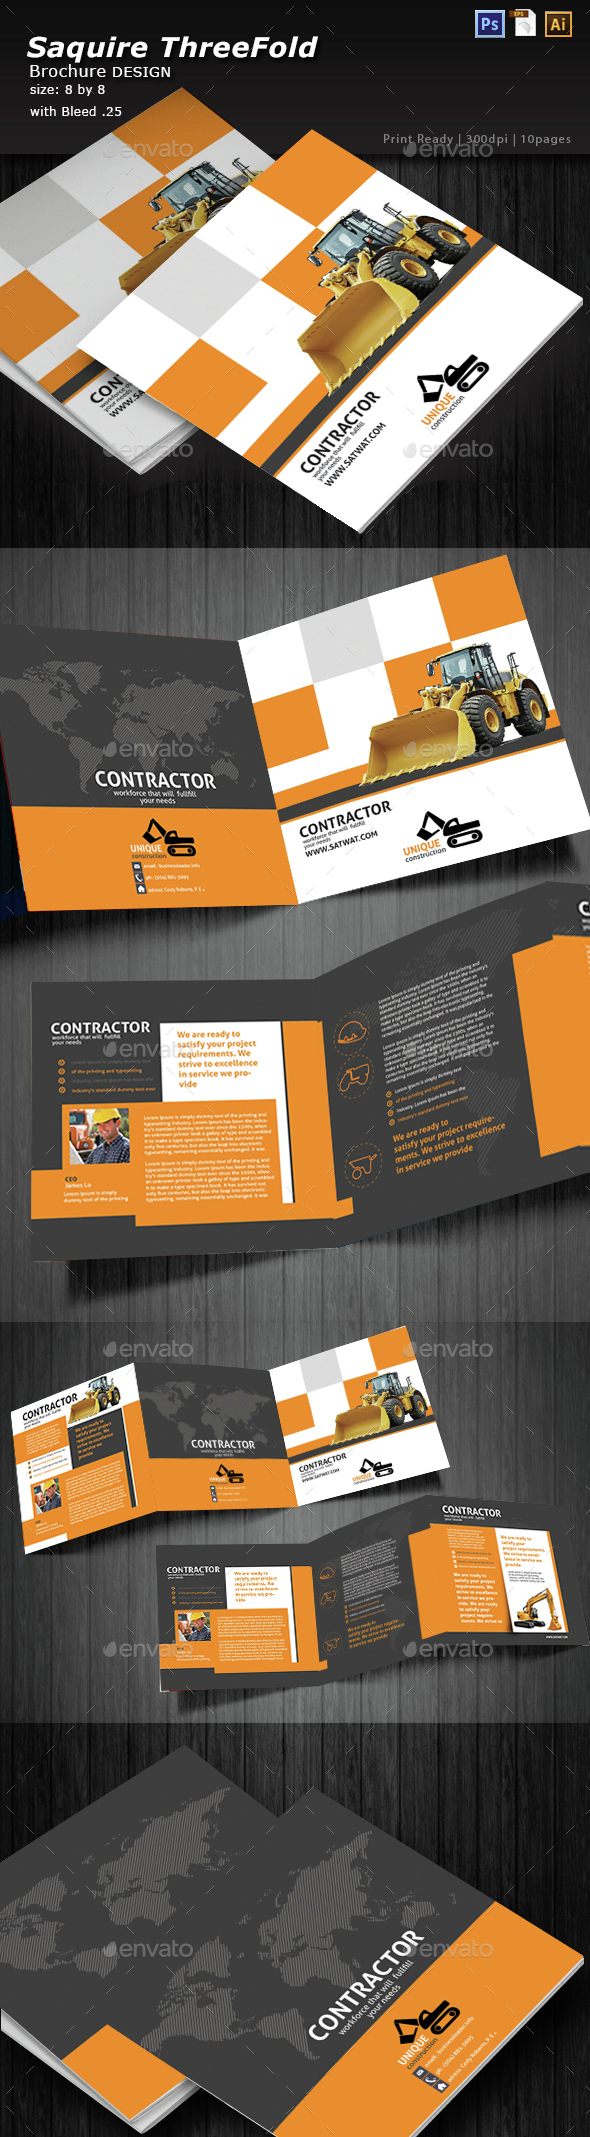 Construction Tri-fold Square Brochure - Brochures Print Templates